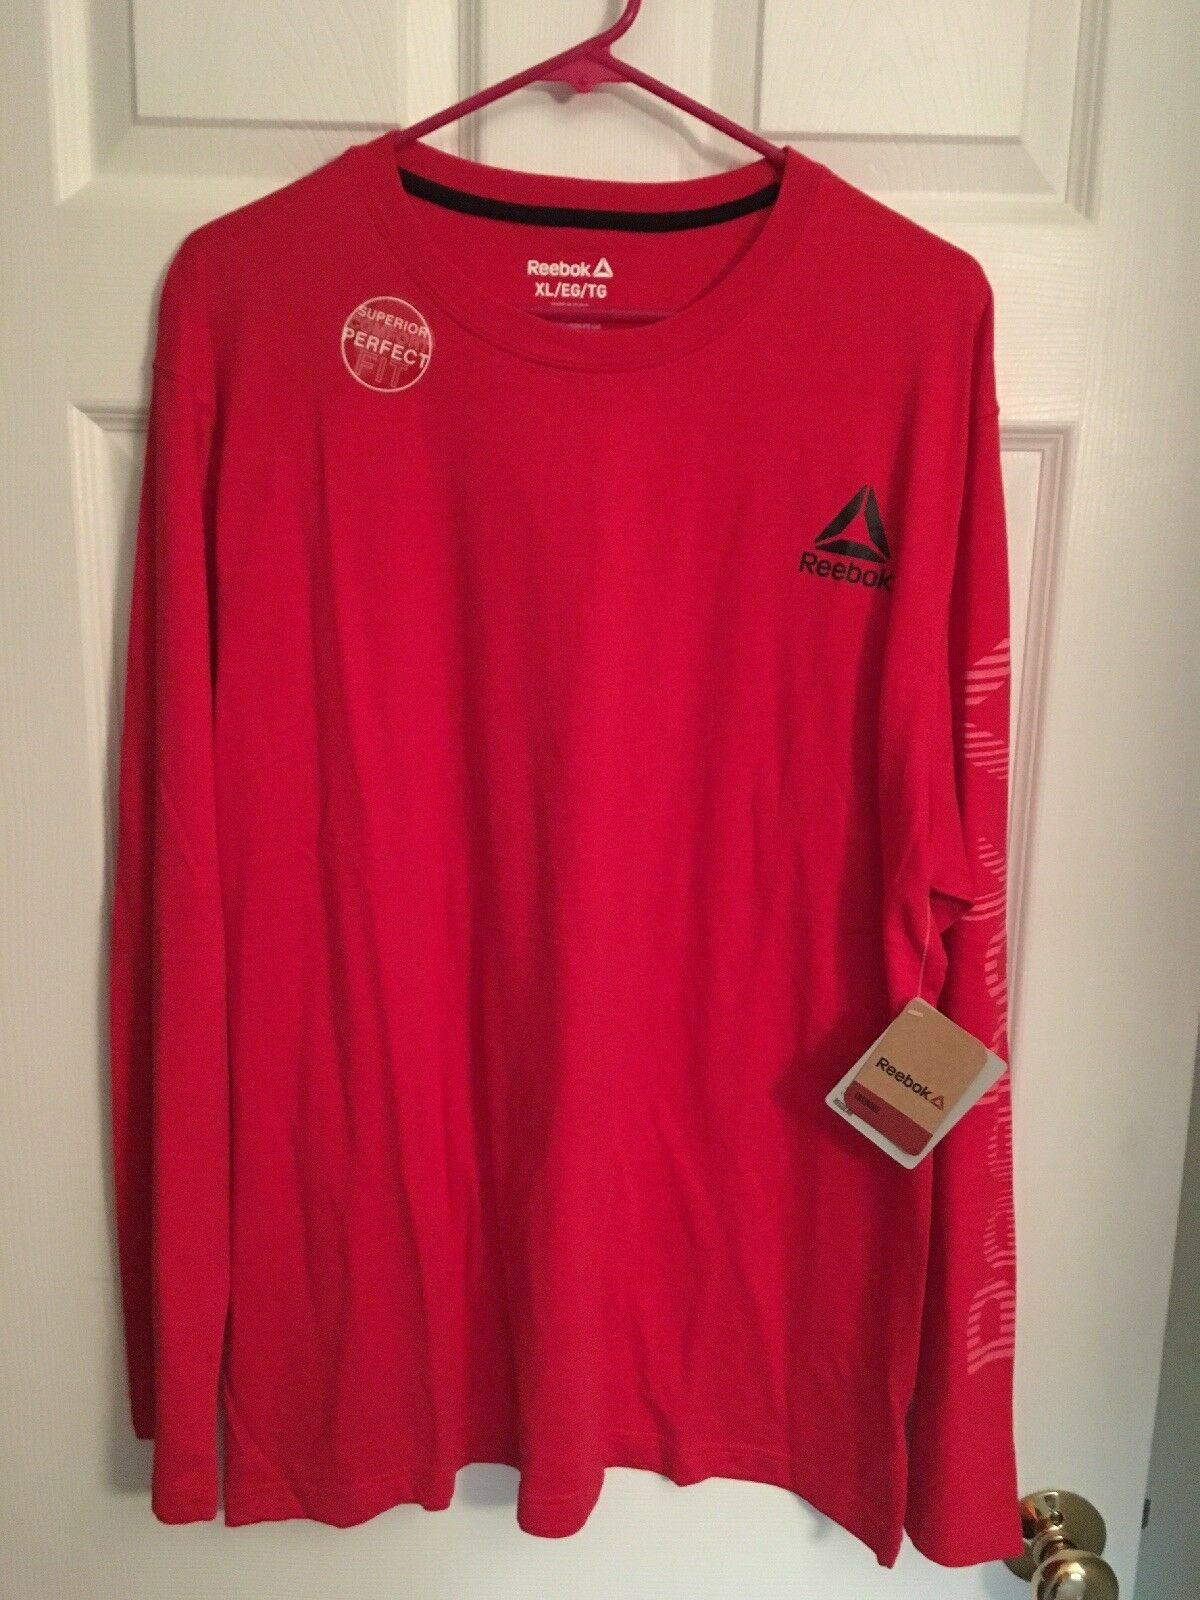 New Reebok Shirt Size  XL